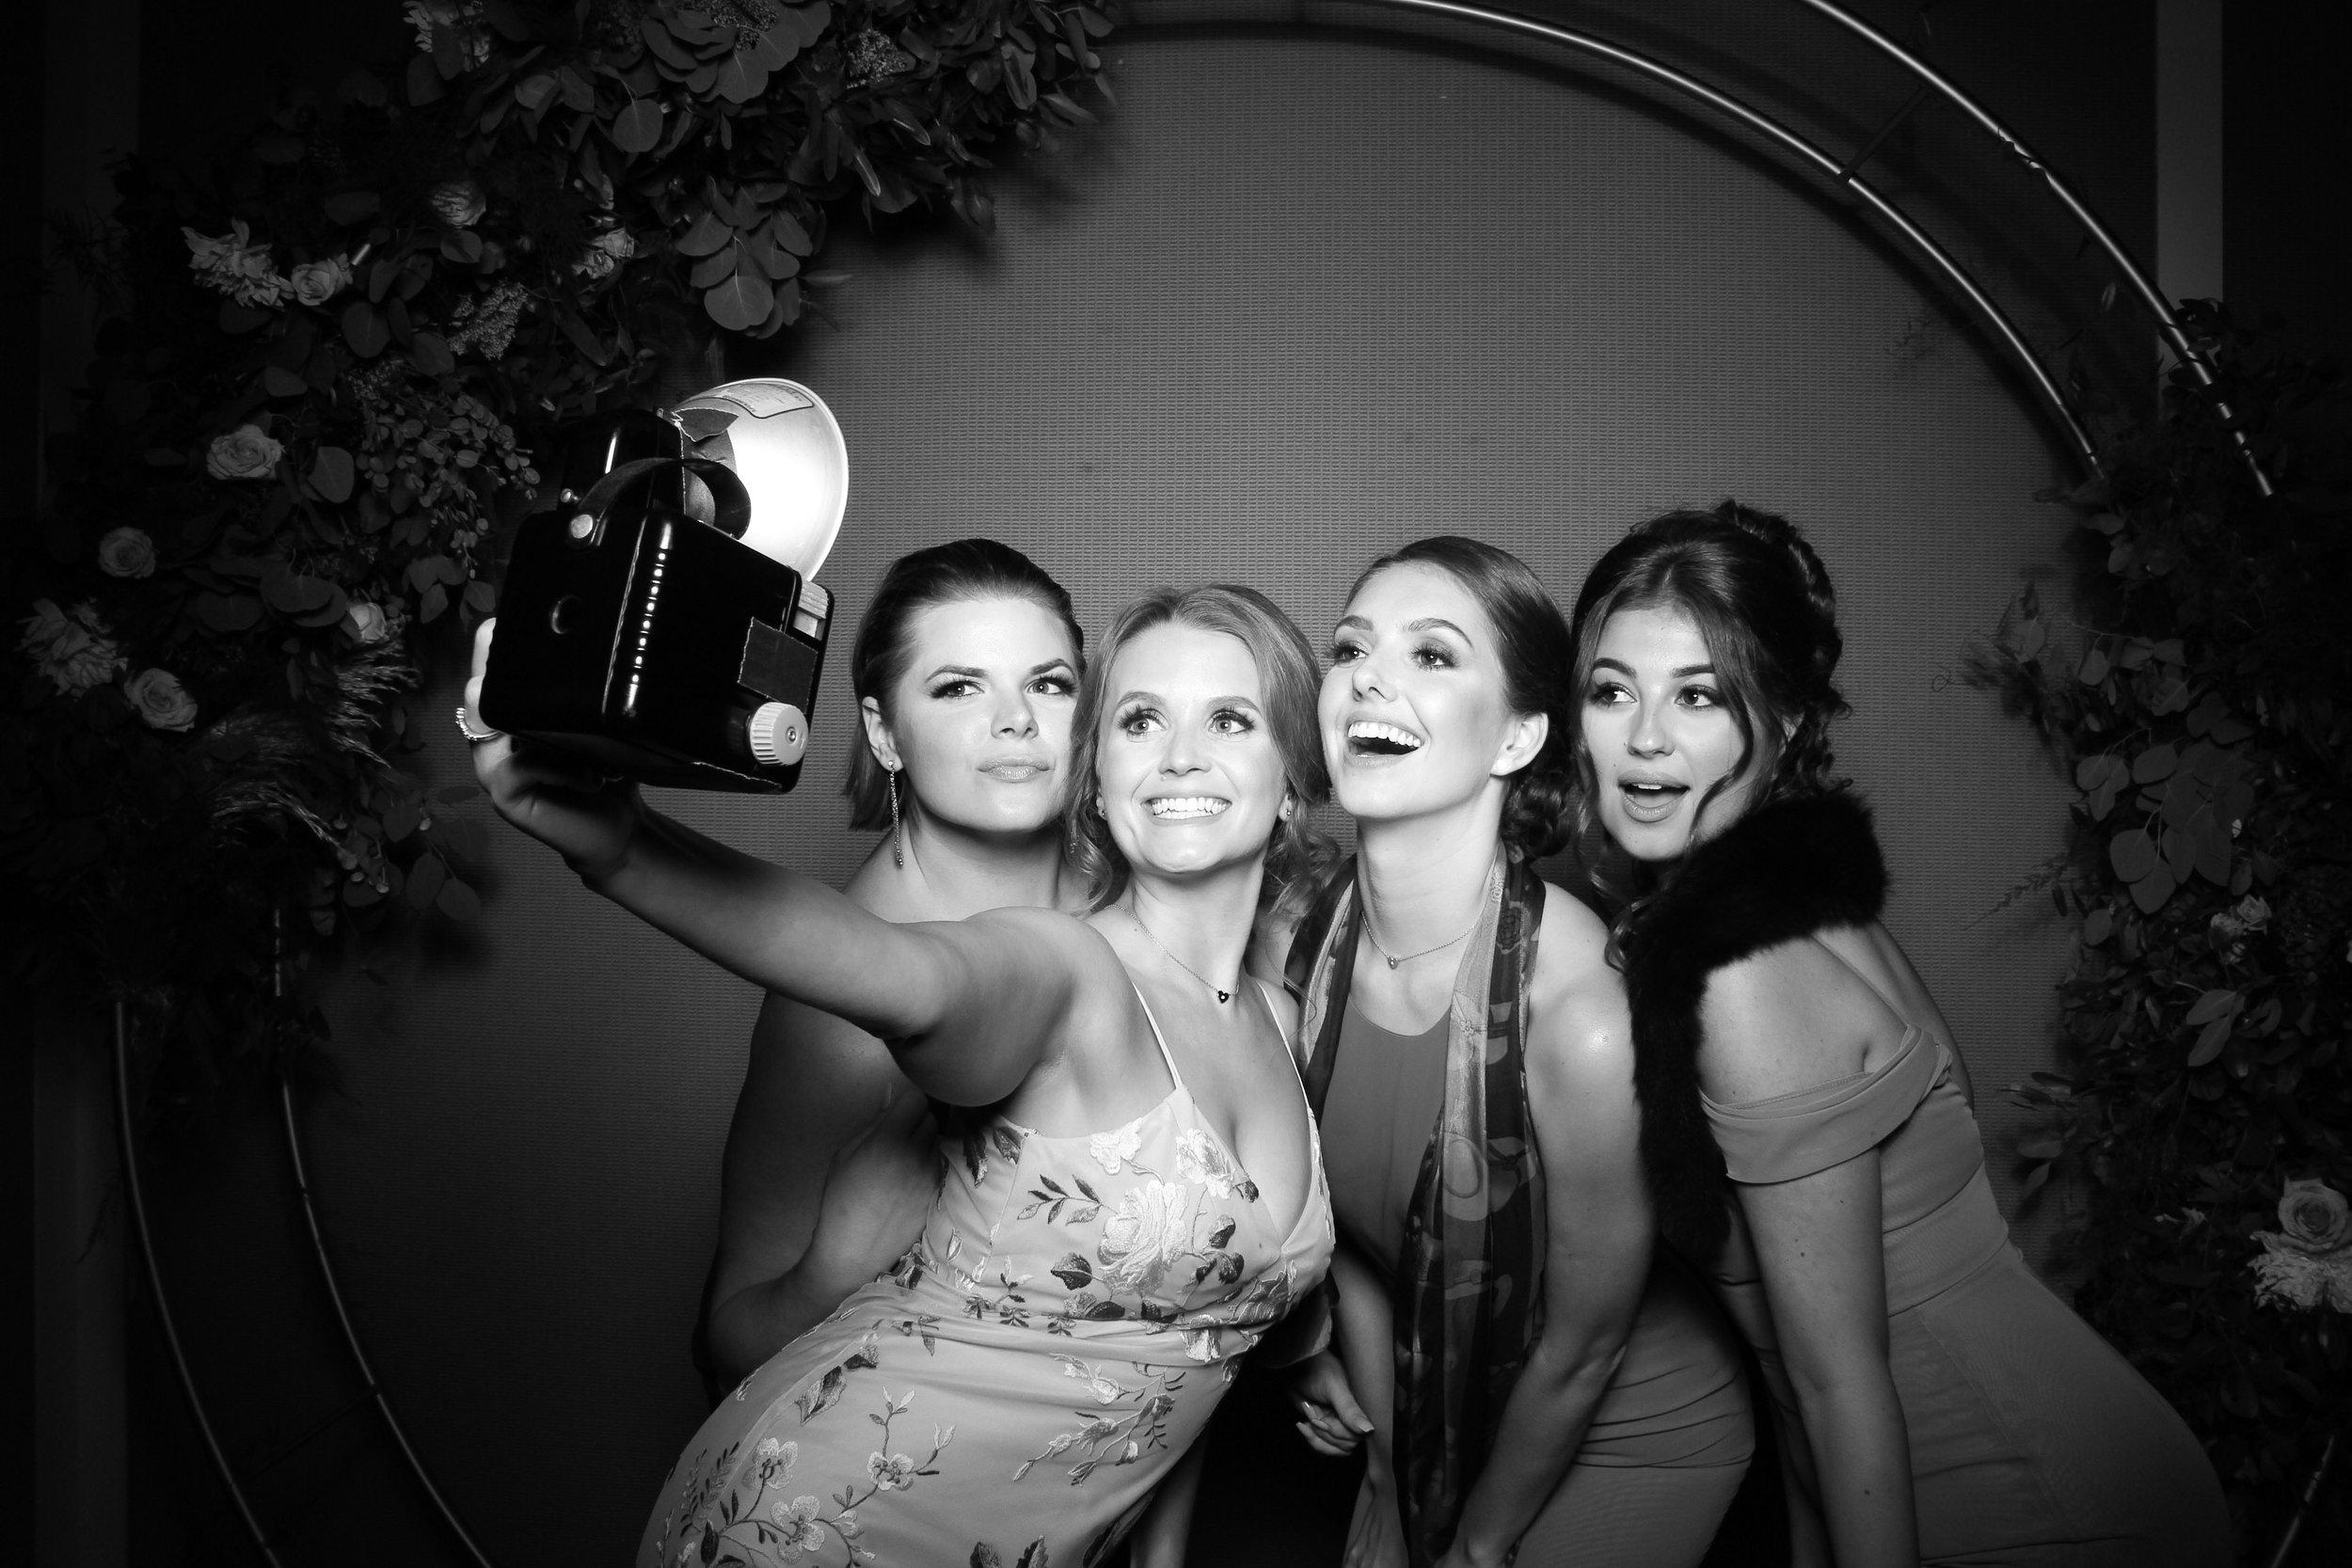 Metropolis_Ballroom_Wedding_Arlington_Heights_Photo_Booth_05.jpg